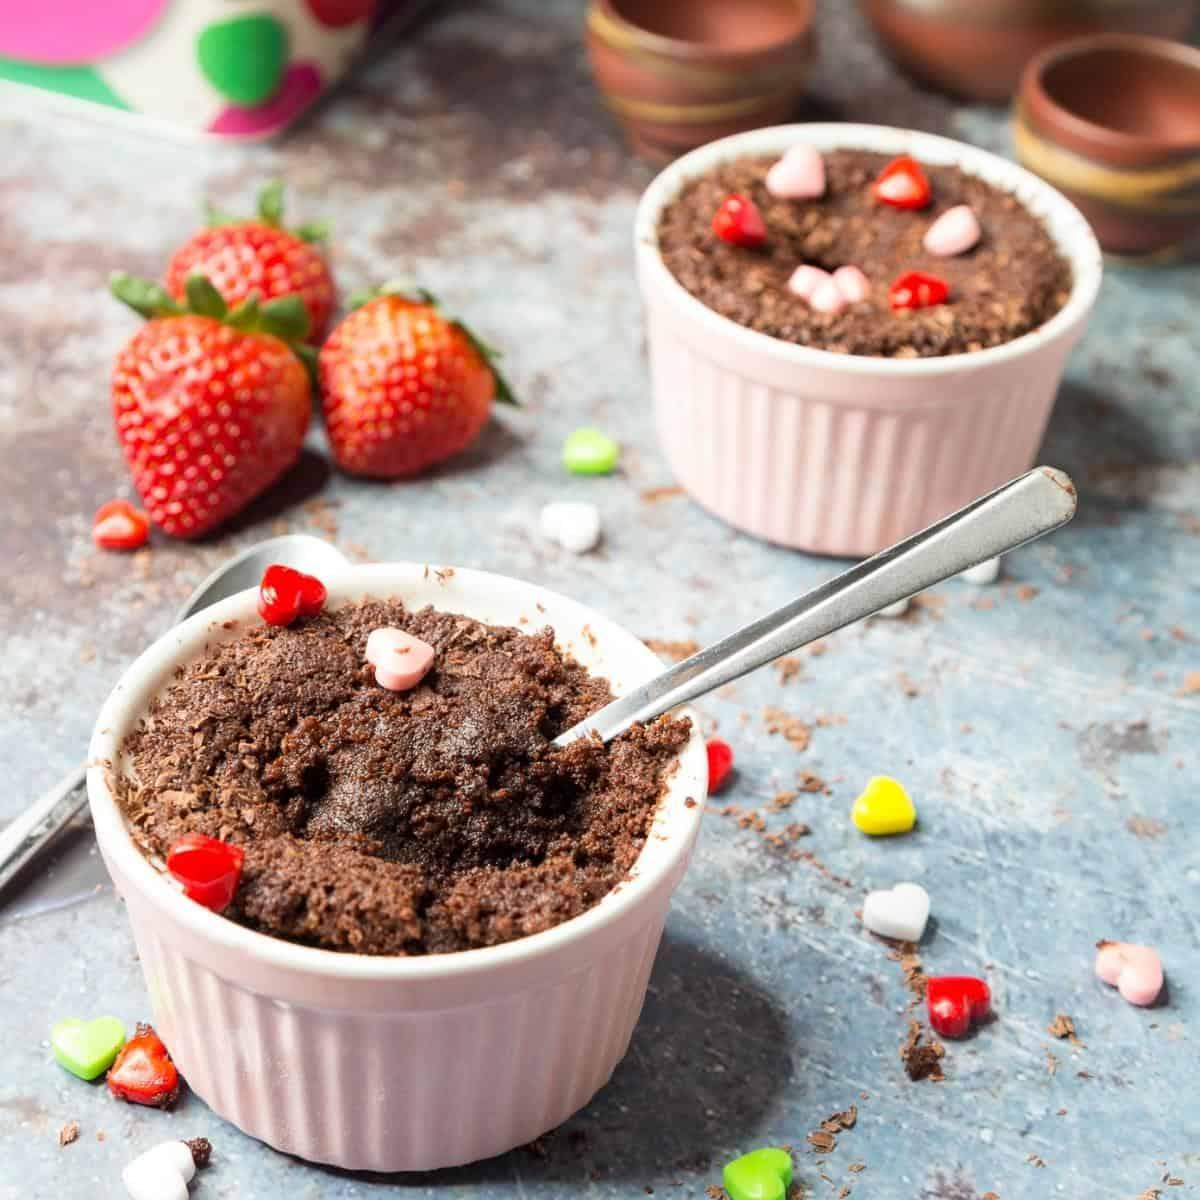 Two ramekins with chocolate fudge cake